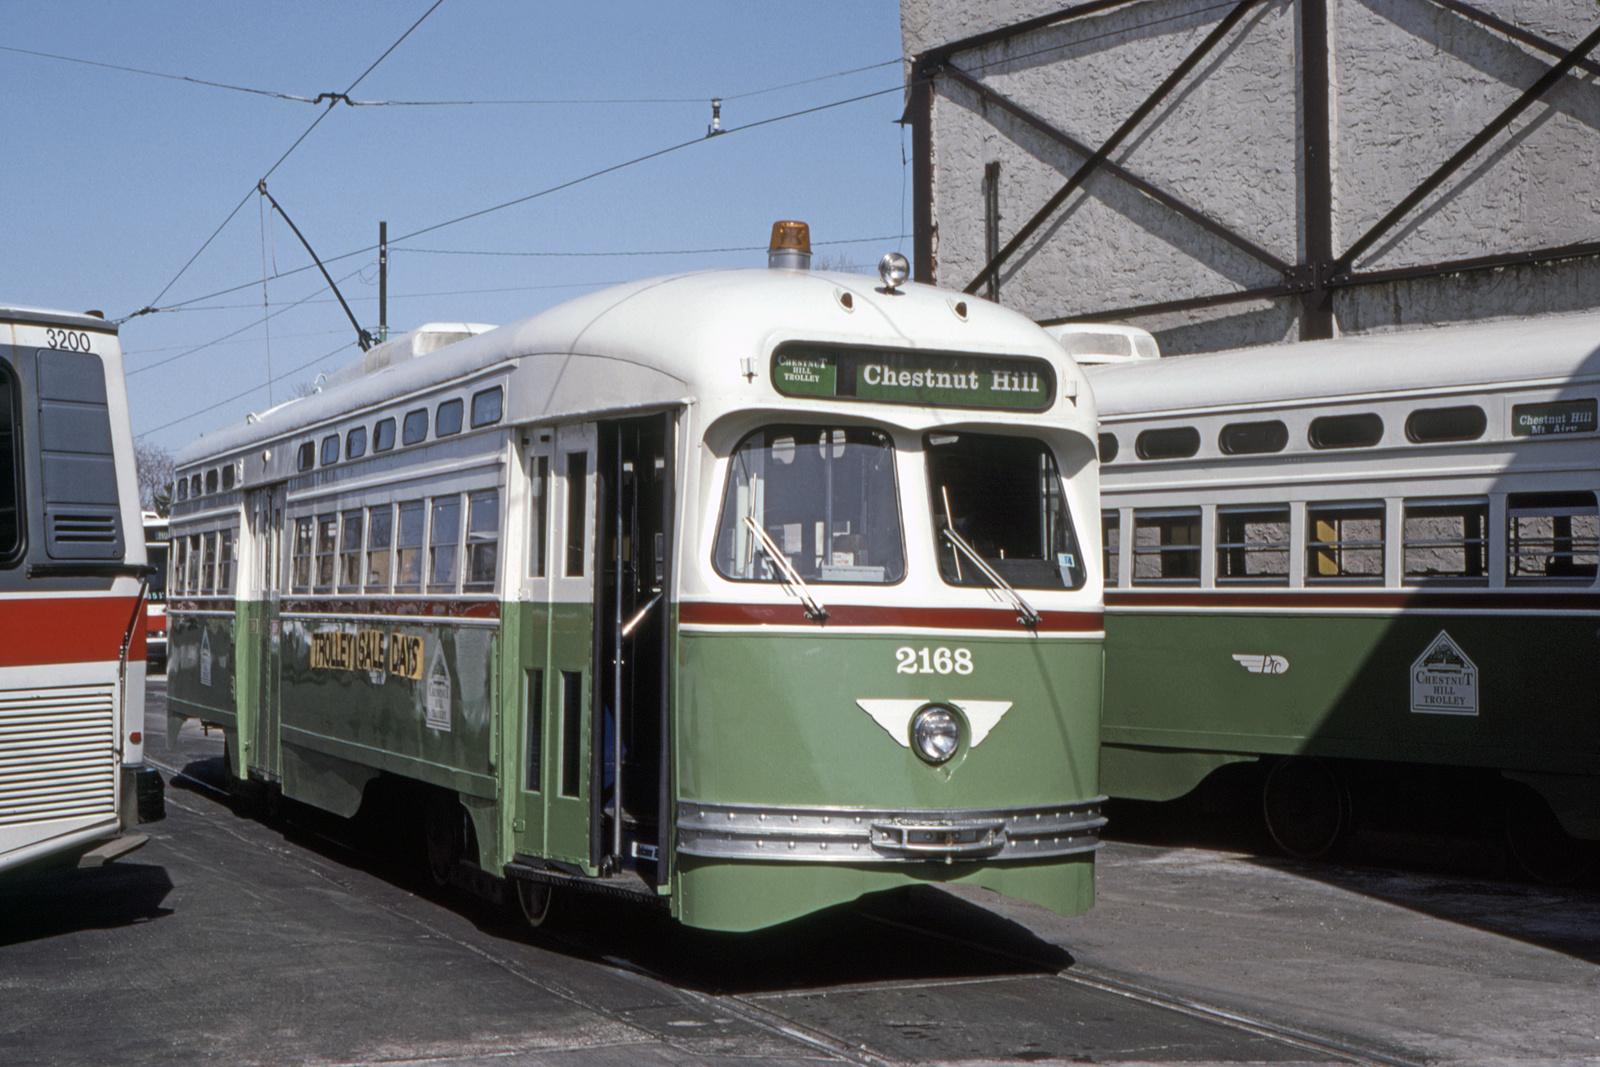 (716k, 1600x1067)<br><b>Country:</b> United States<br><b>City:</b> Philadelphia, PA<br><b>System:</b> SEPTA (or Predecessor)<br><b>Line:</b> Rt. 23-Germantown<br><b>Location:</b> Germantown Depot<br><b>Car:</b> PTC/SEPTA Postwar All-electric PCC (St.Louis, 1948) 2168 <br><b>Collection of:</b> David Pirmann<br><b>Date:</b> 5/1993<br><b>Viewed (this week/total):</b> 0 / 48